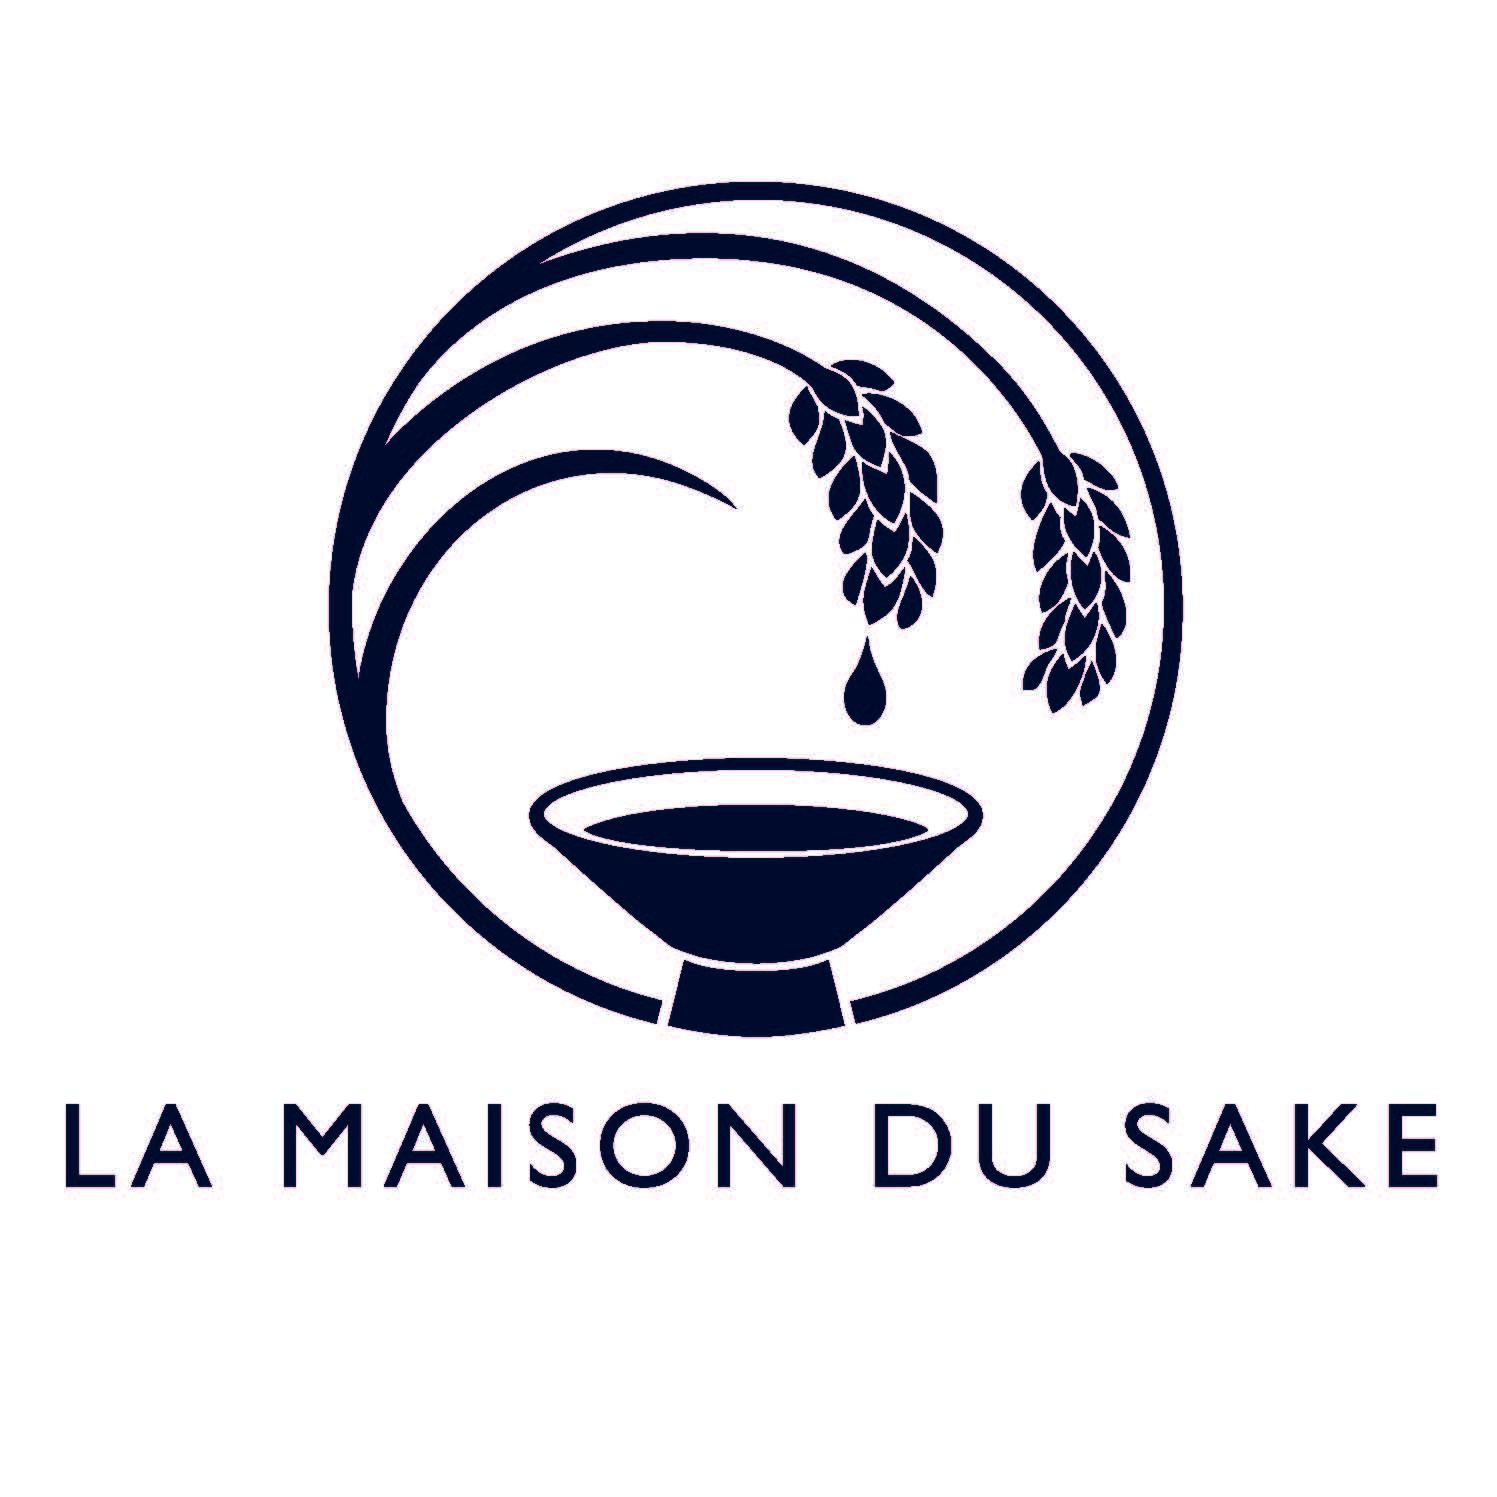 LMDS logo LA MAISON DU SAKE bleu marin (2) (1).jpg